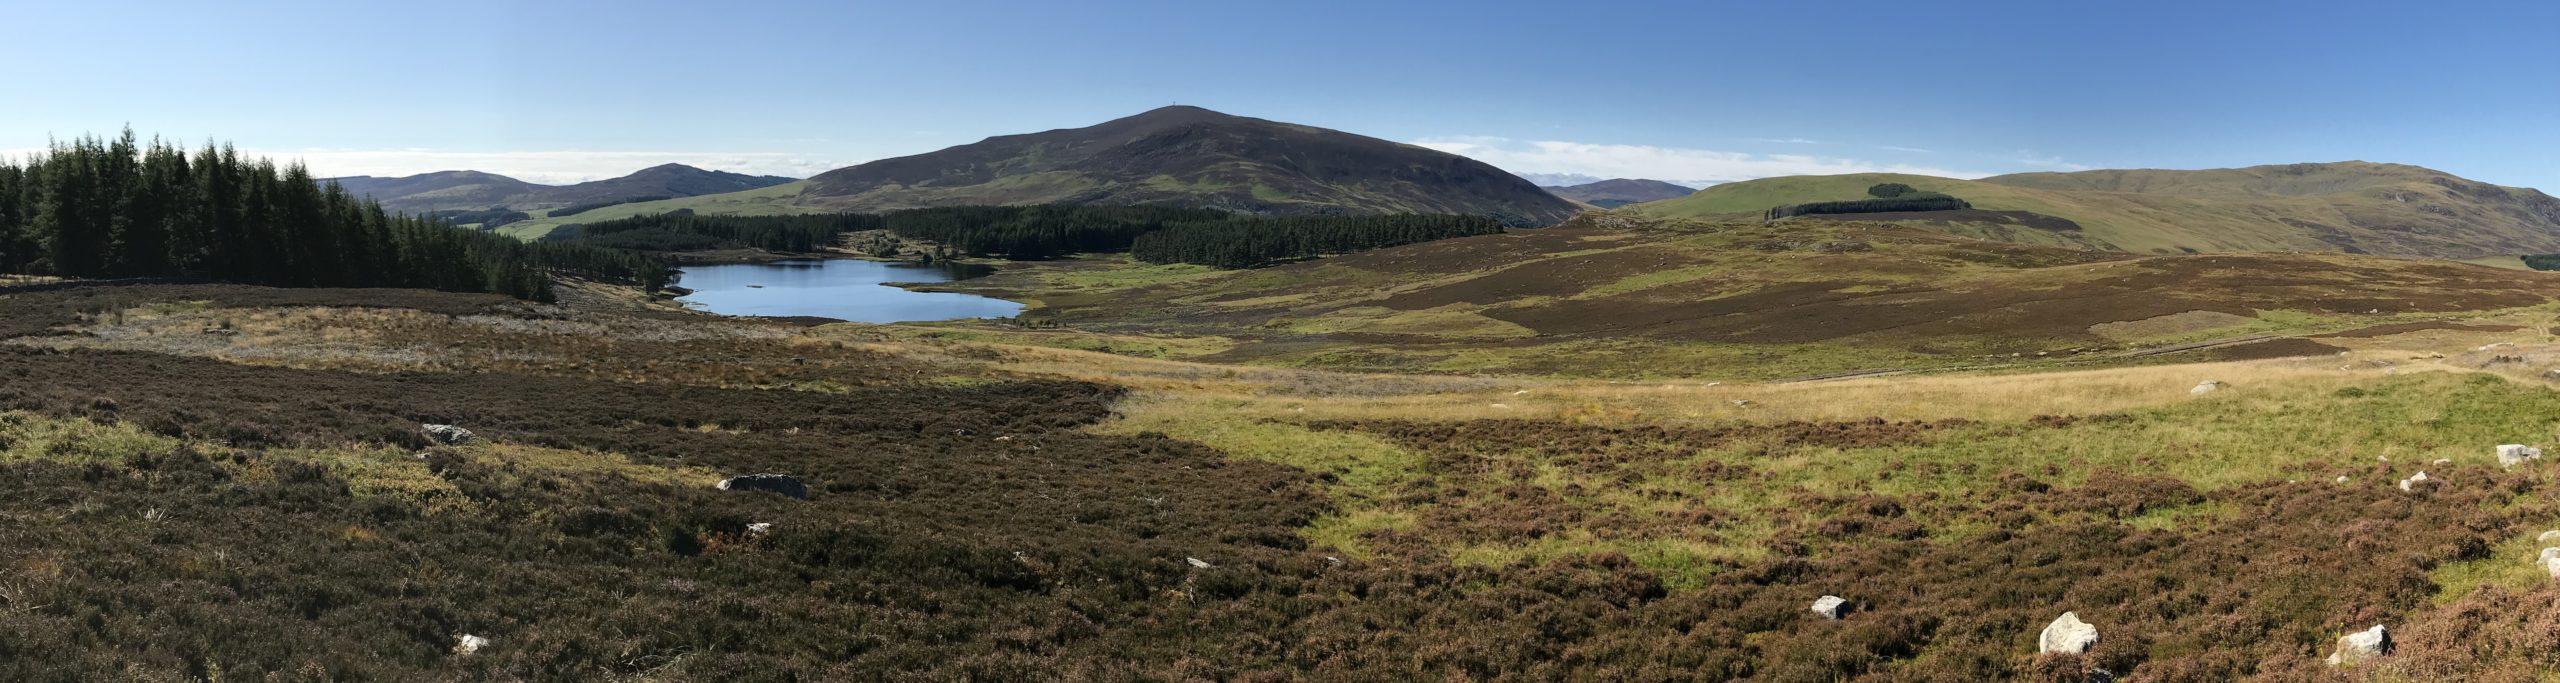 Loch Shandra and Mount Blair - Panorama